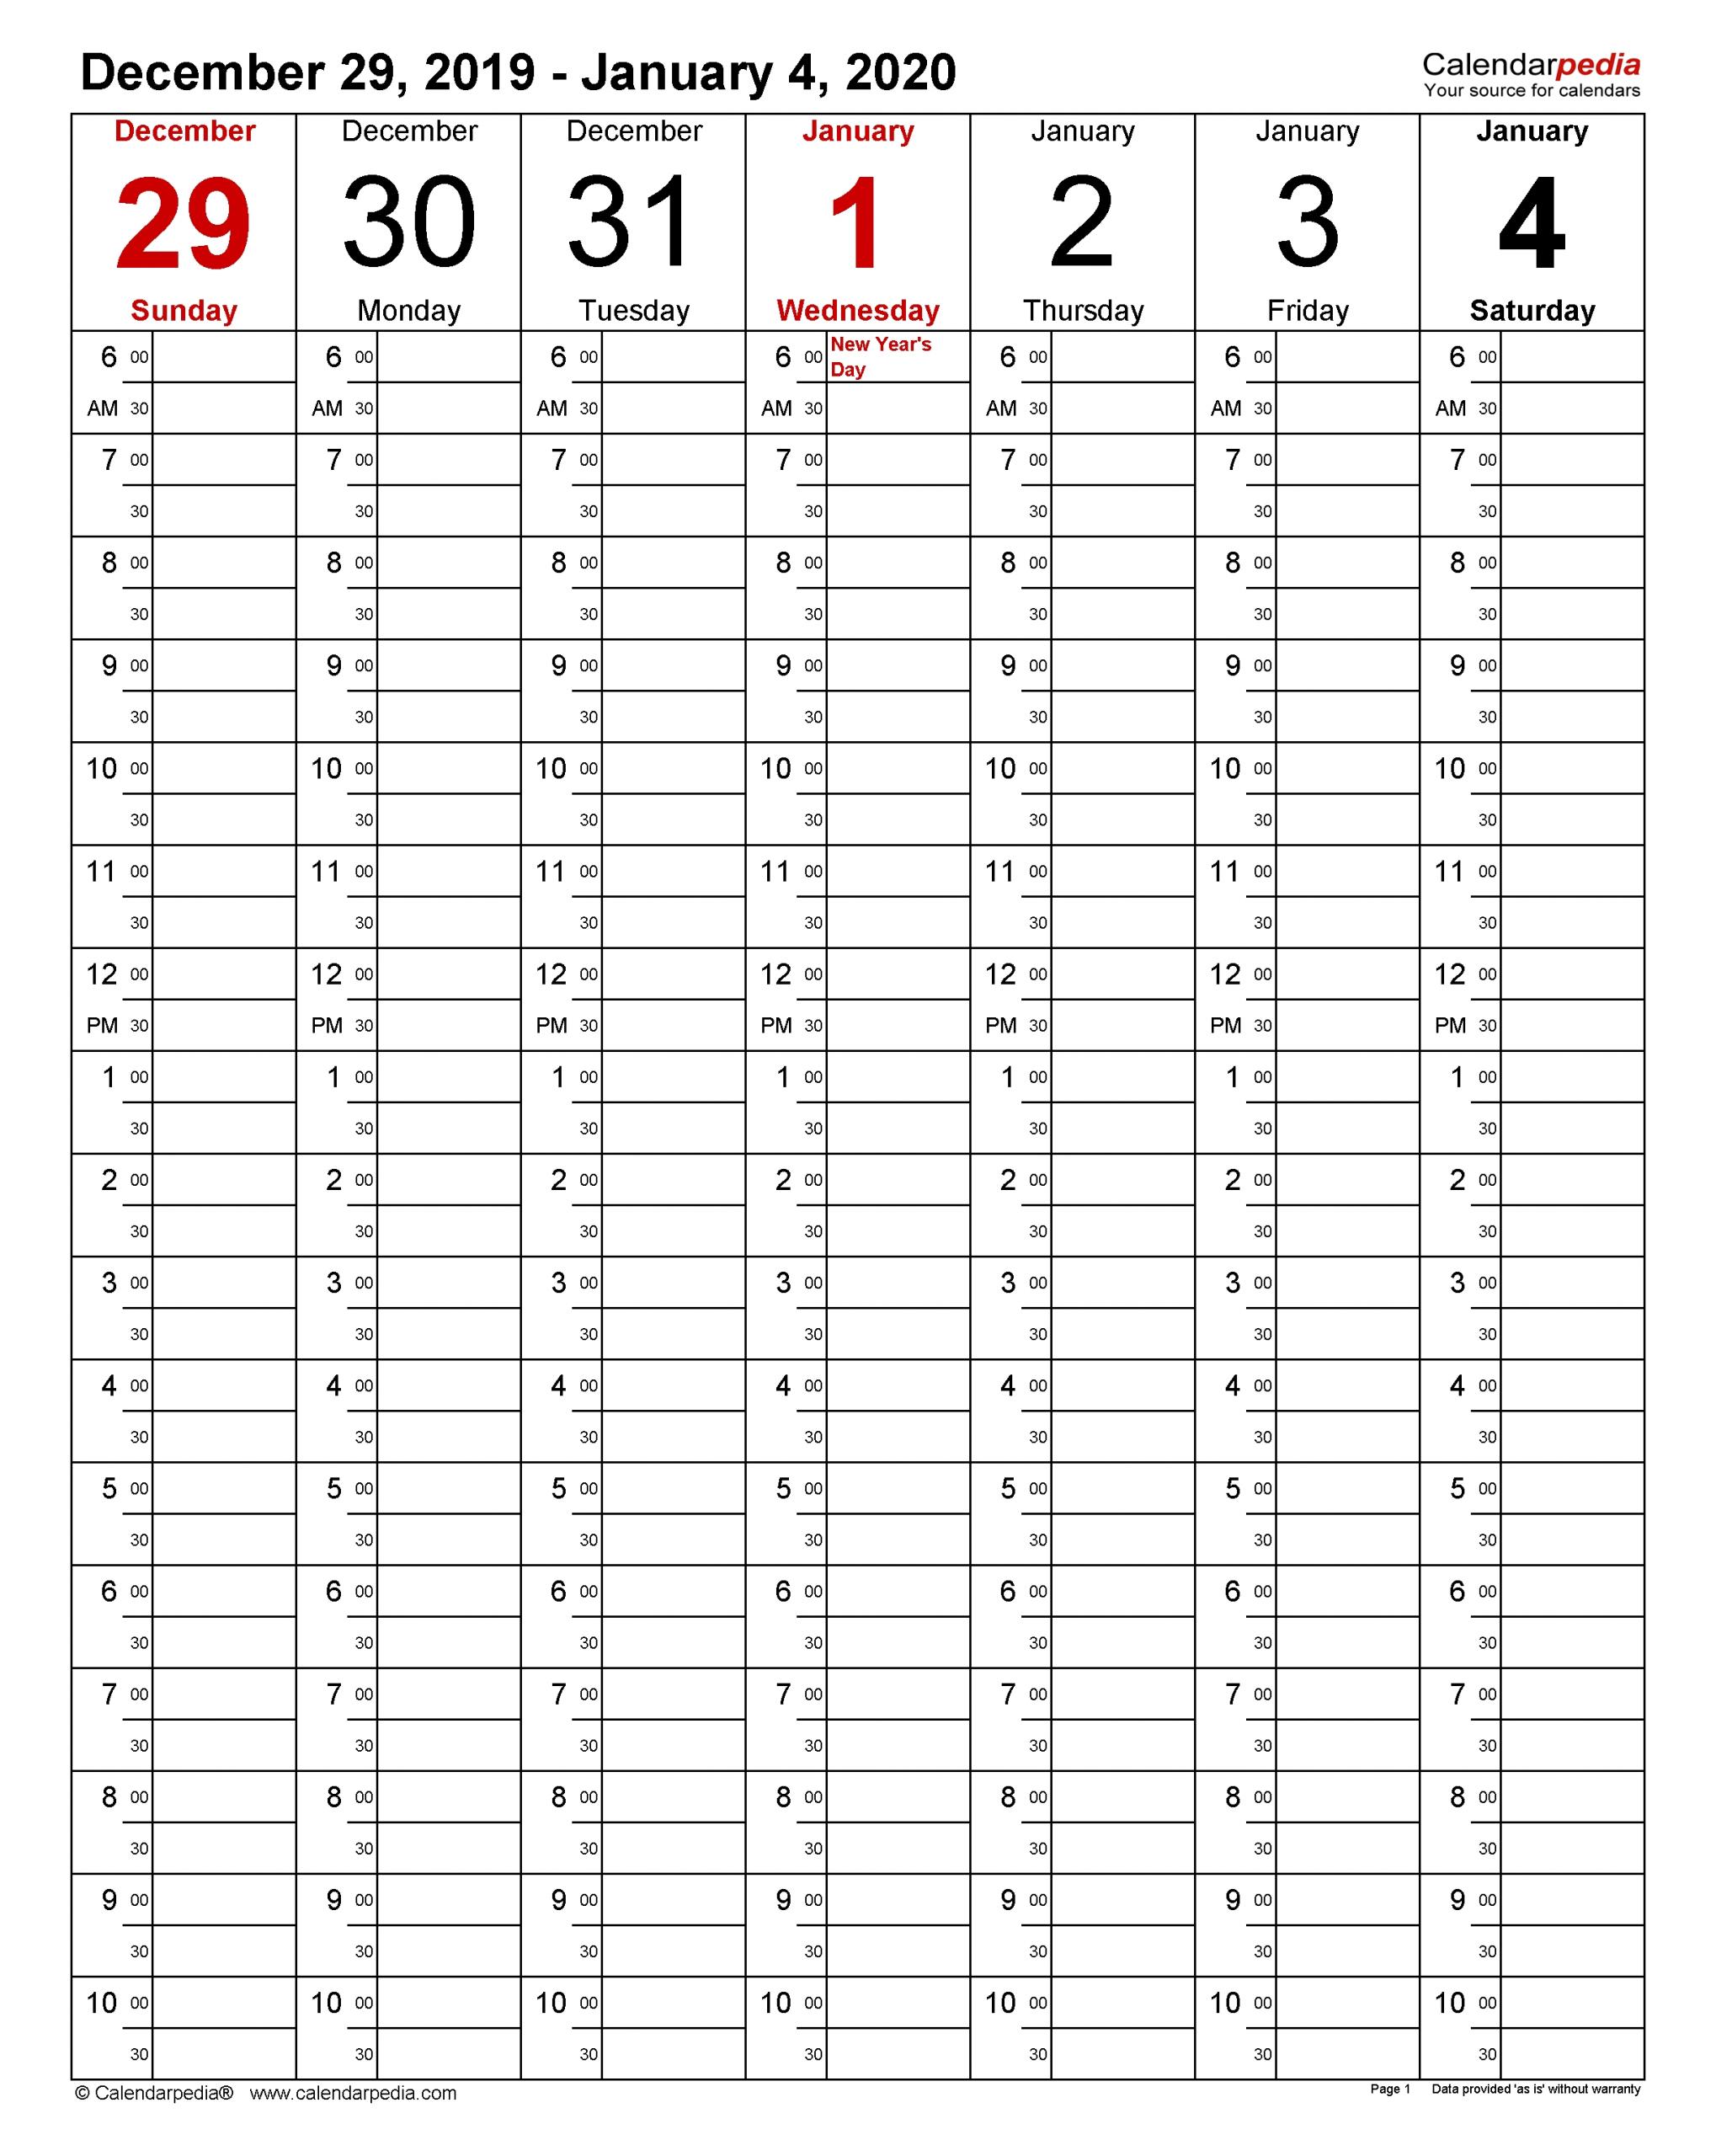 Weekly Calendars 2020 For Pdf - 12 Free Printable Templates pertaining to 8.5 X 11 Free Printable Calendars